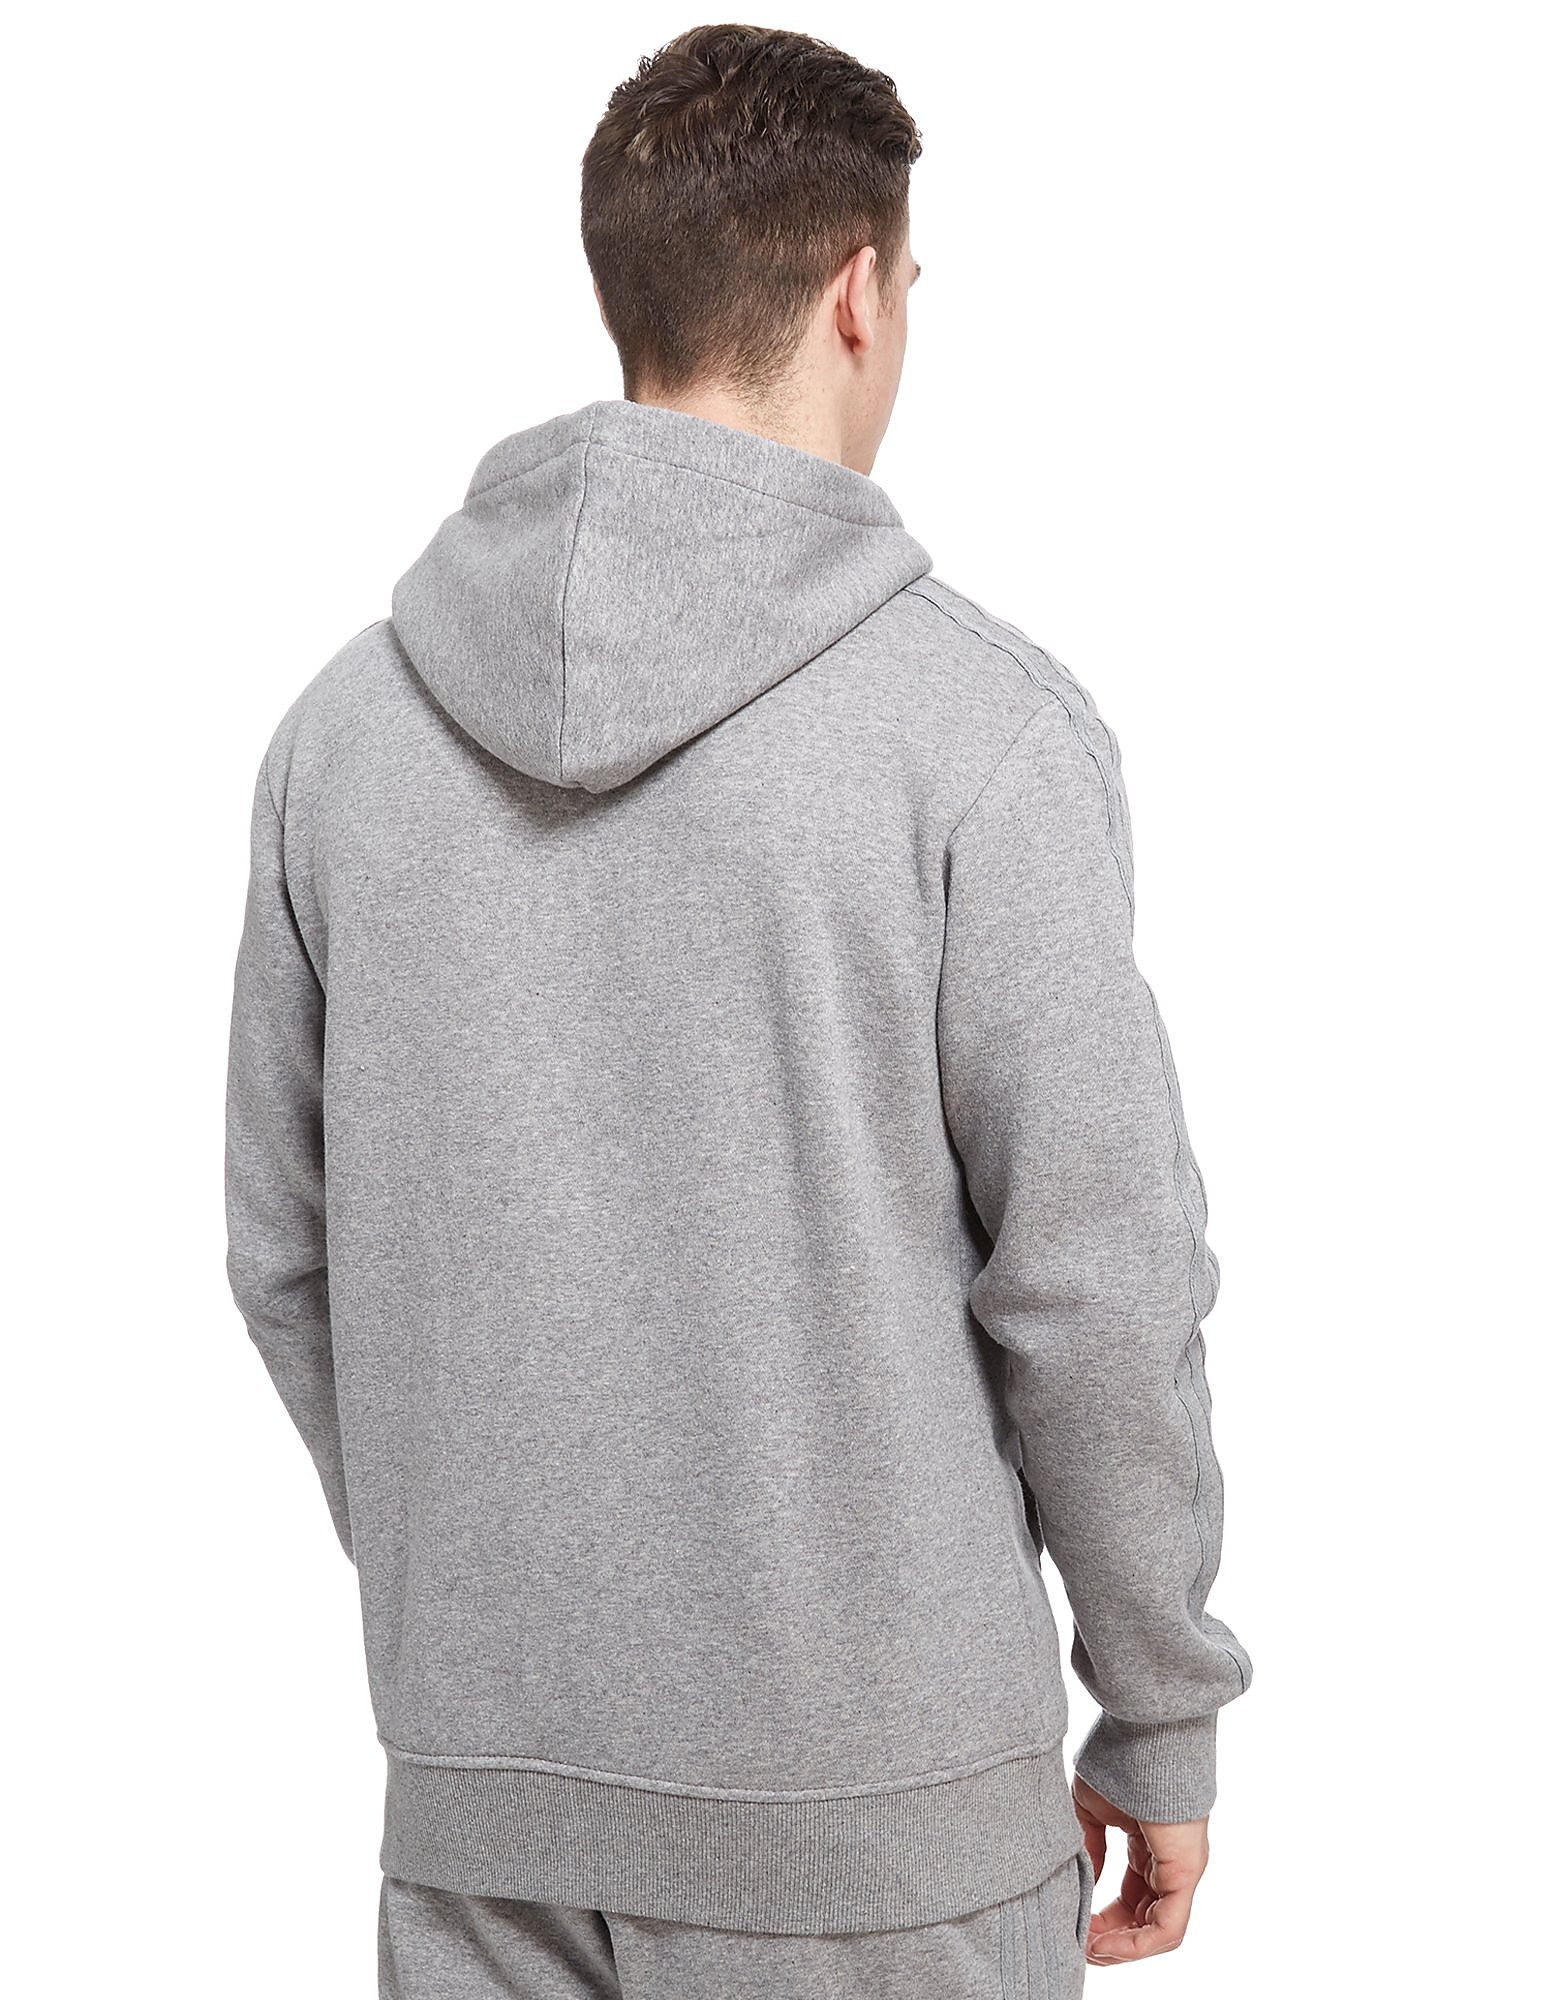 adidas Originals Trefoil Full Zip Hoody